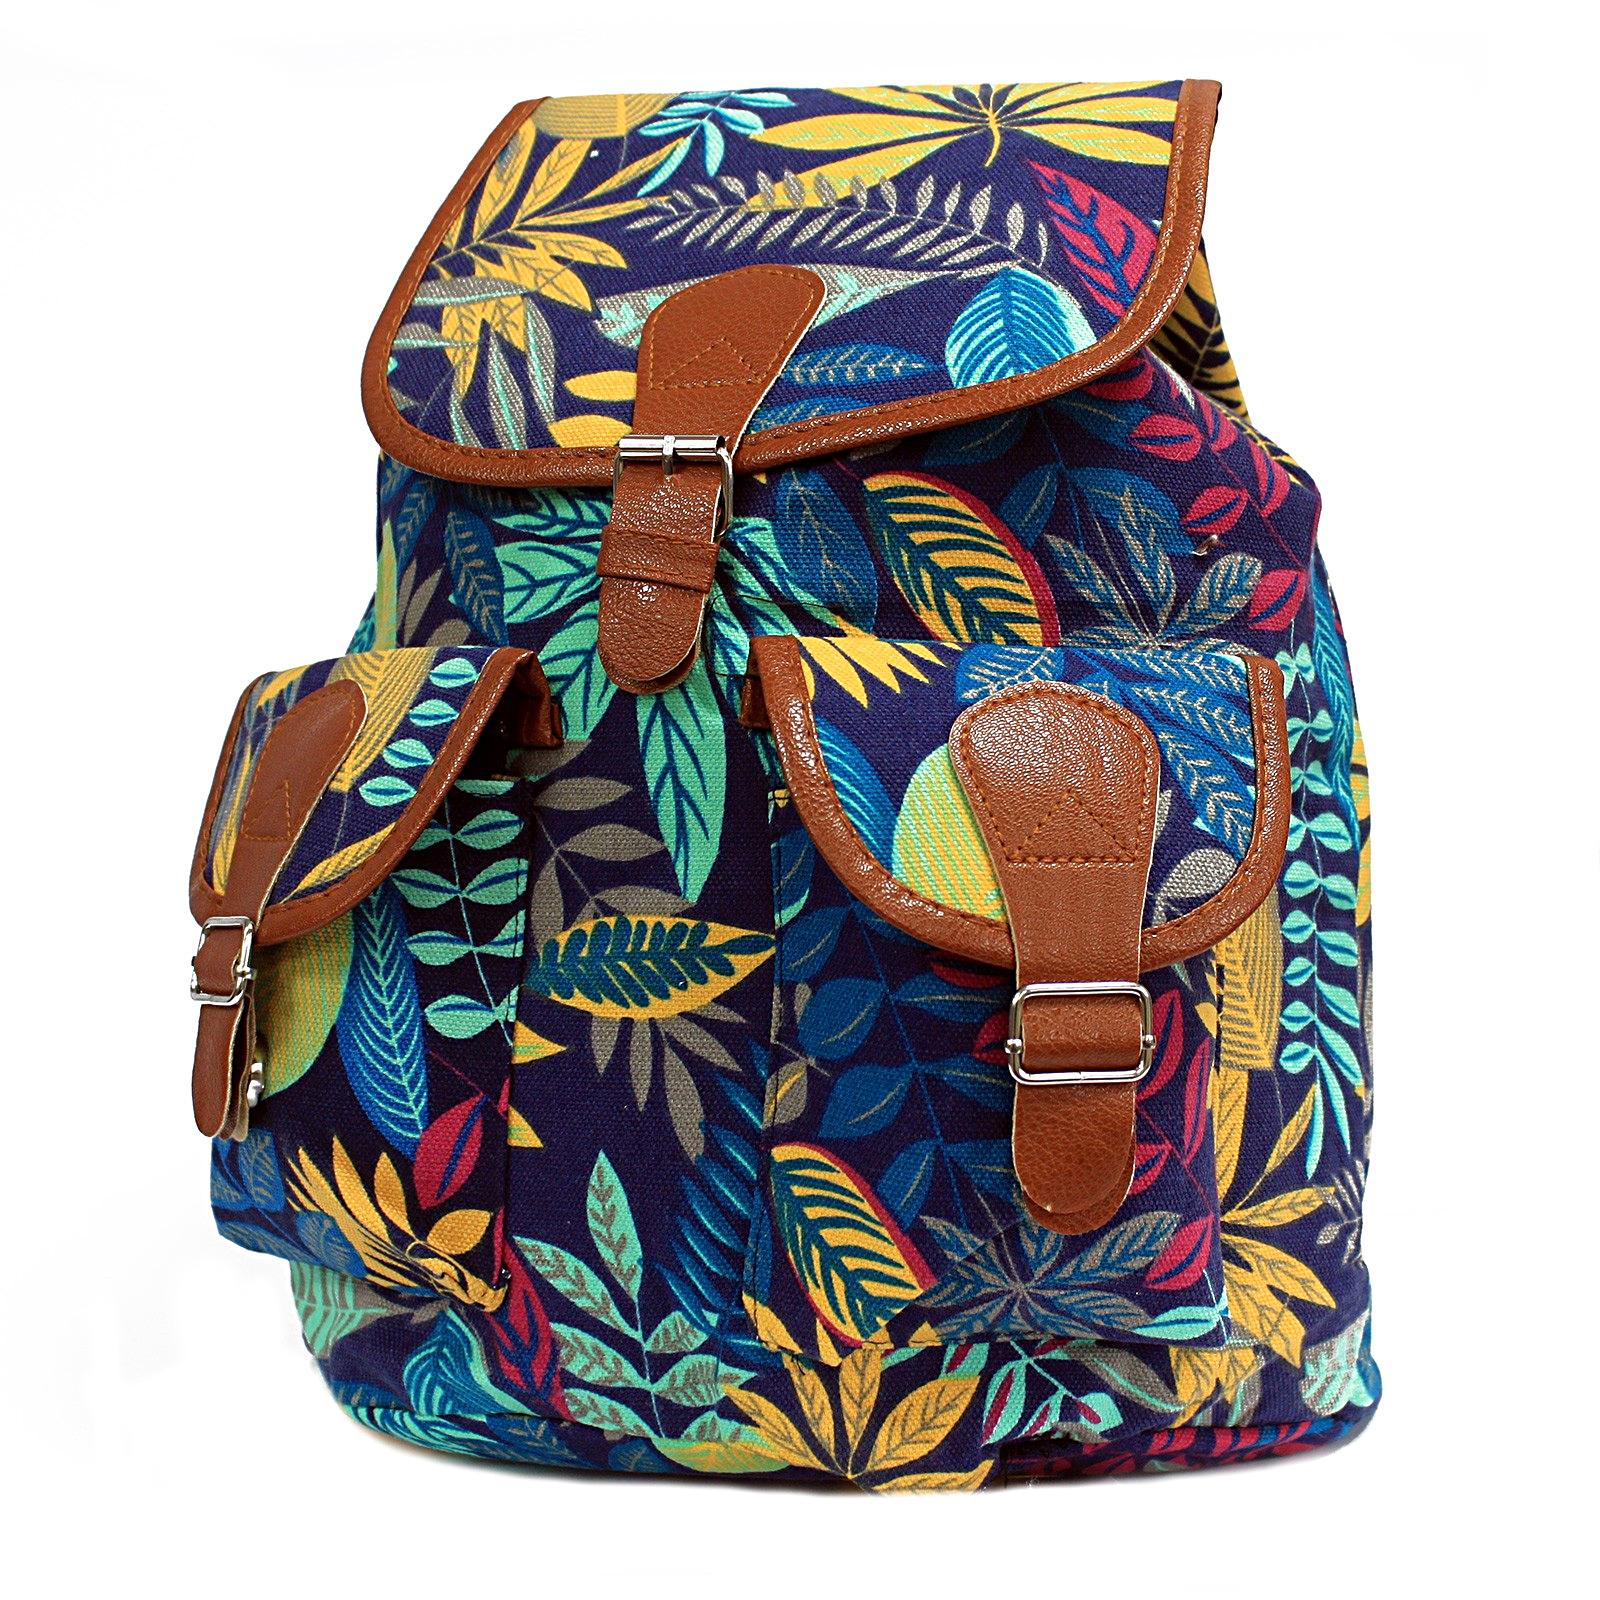 Jungle Backpack Bag Leaf Print Design Big Canvas Rucksack Blue Teal 7fdbc8f47091f